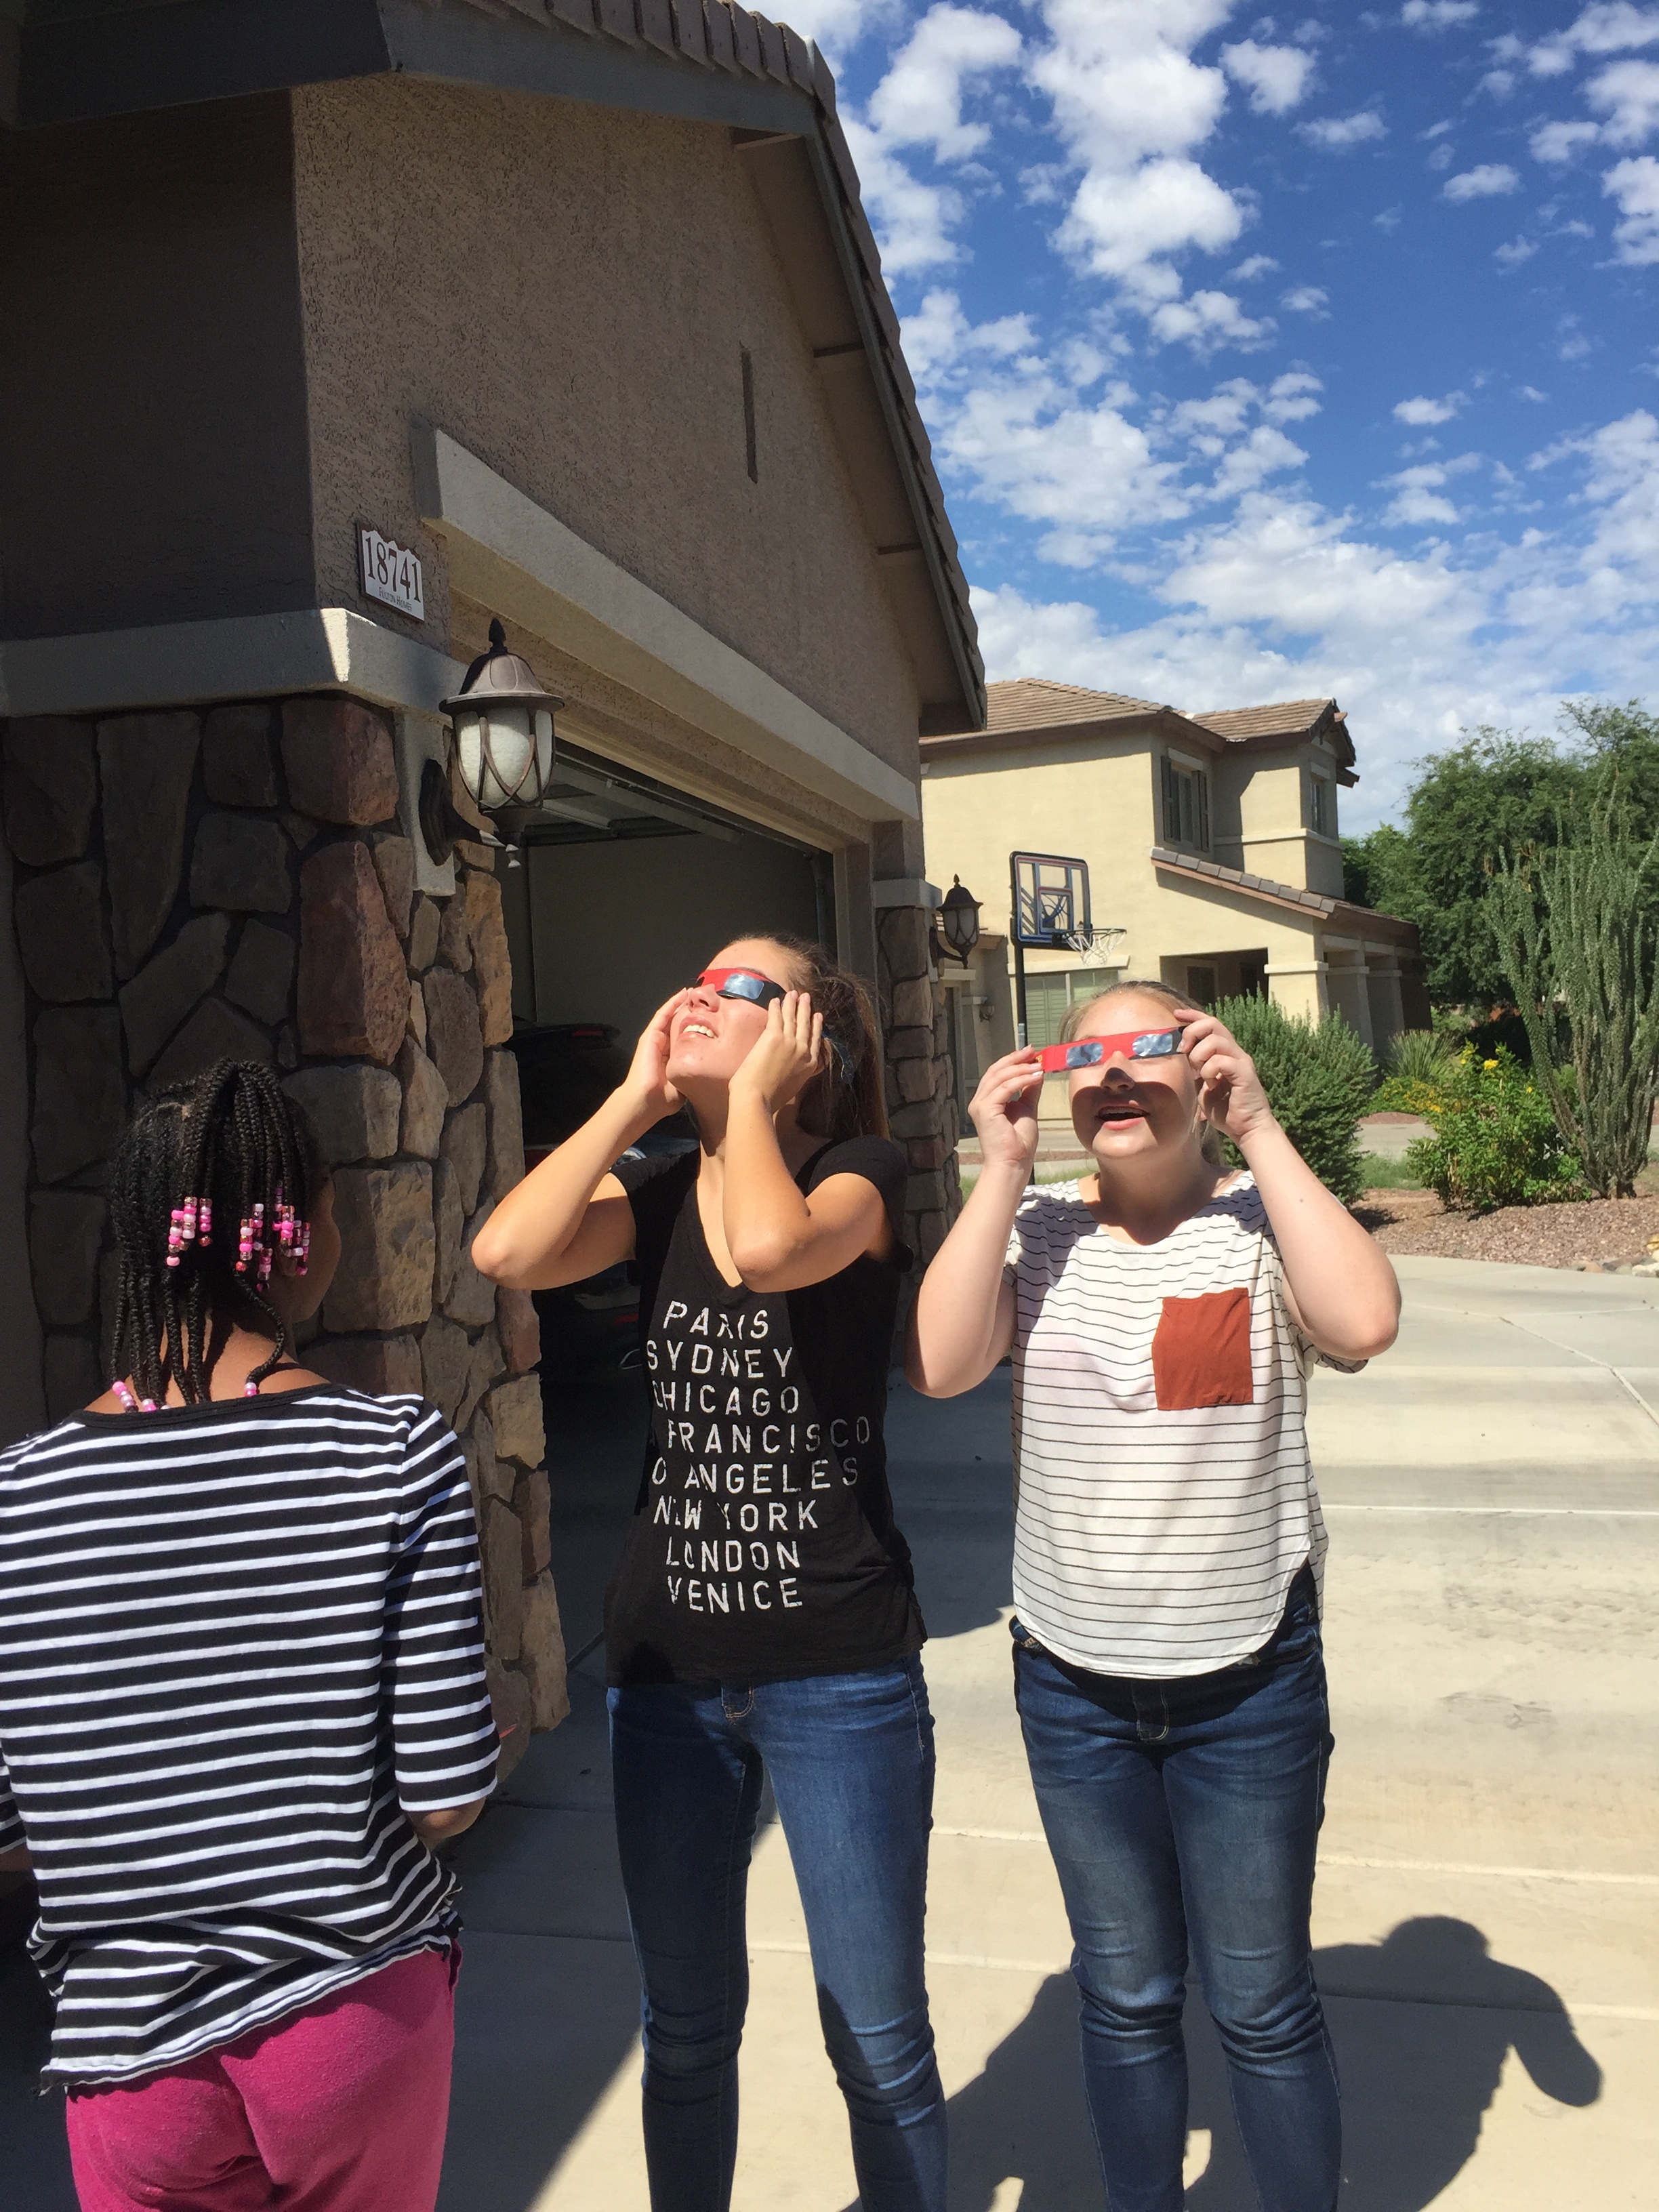 solar eclipse watching